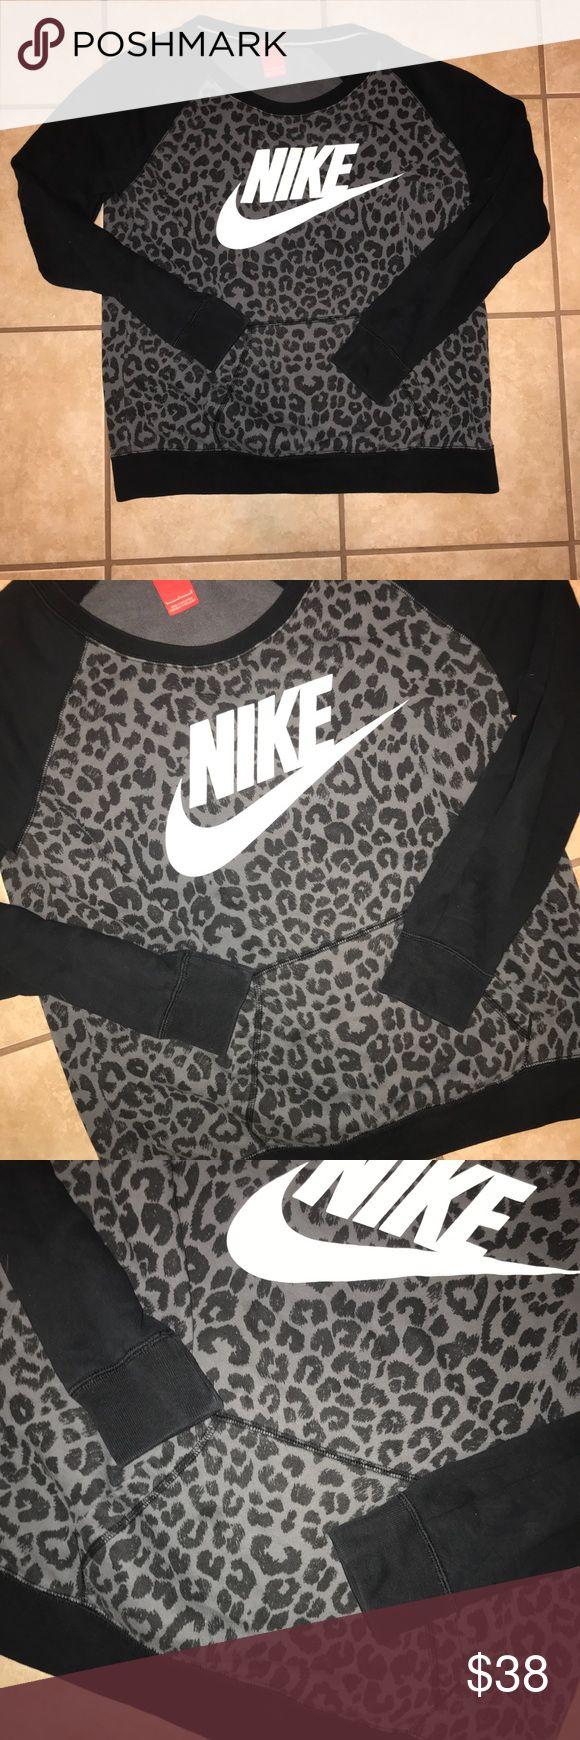 Nike Leopard print pullover sweatshirt Beautiful Nike leopard print pullover. It's in like new condition. Has a front pocket (like a hoodie). Nike Tops Sweatshirts & Hoodies